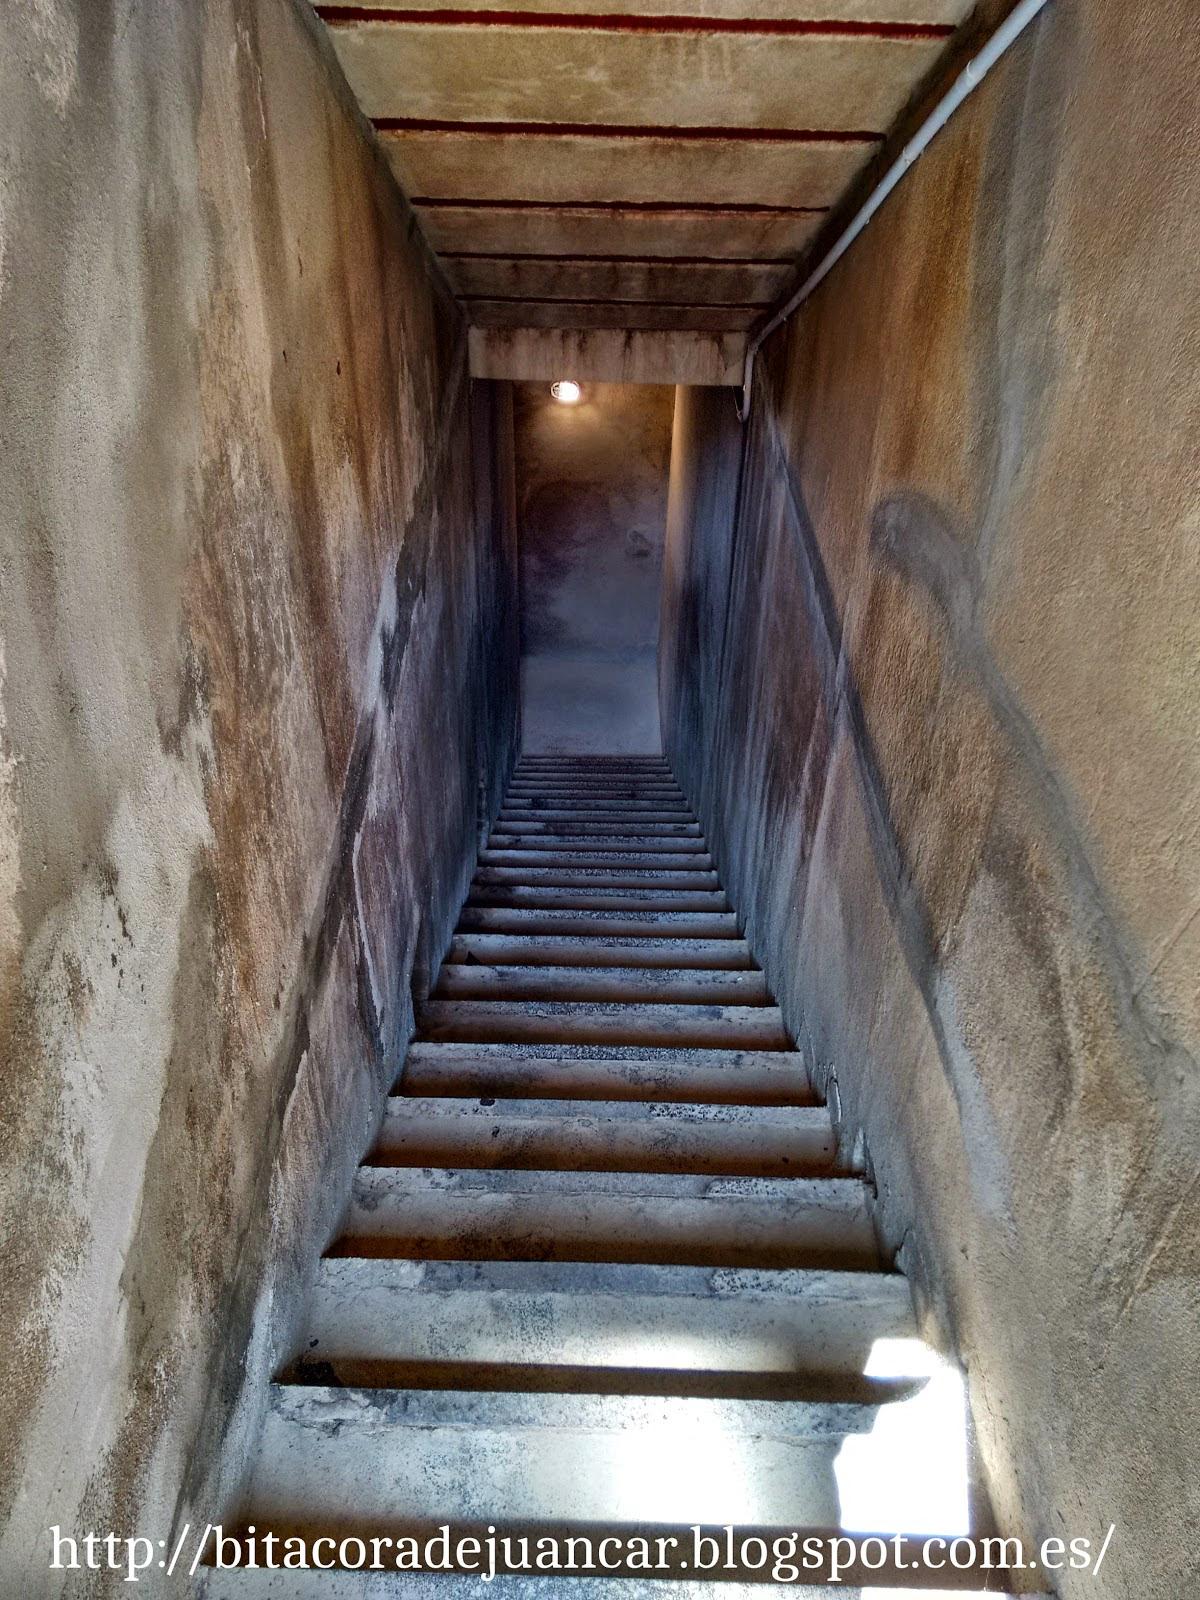 Escalera Luis Vives. Bitácora de Juancar